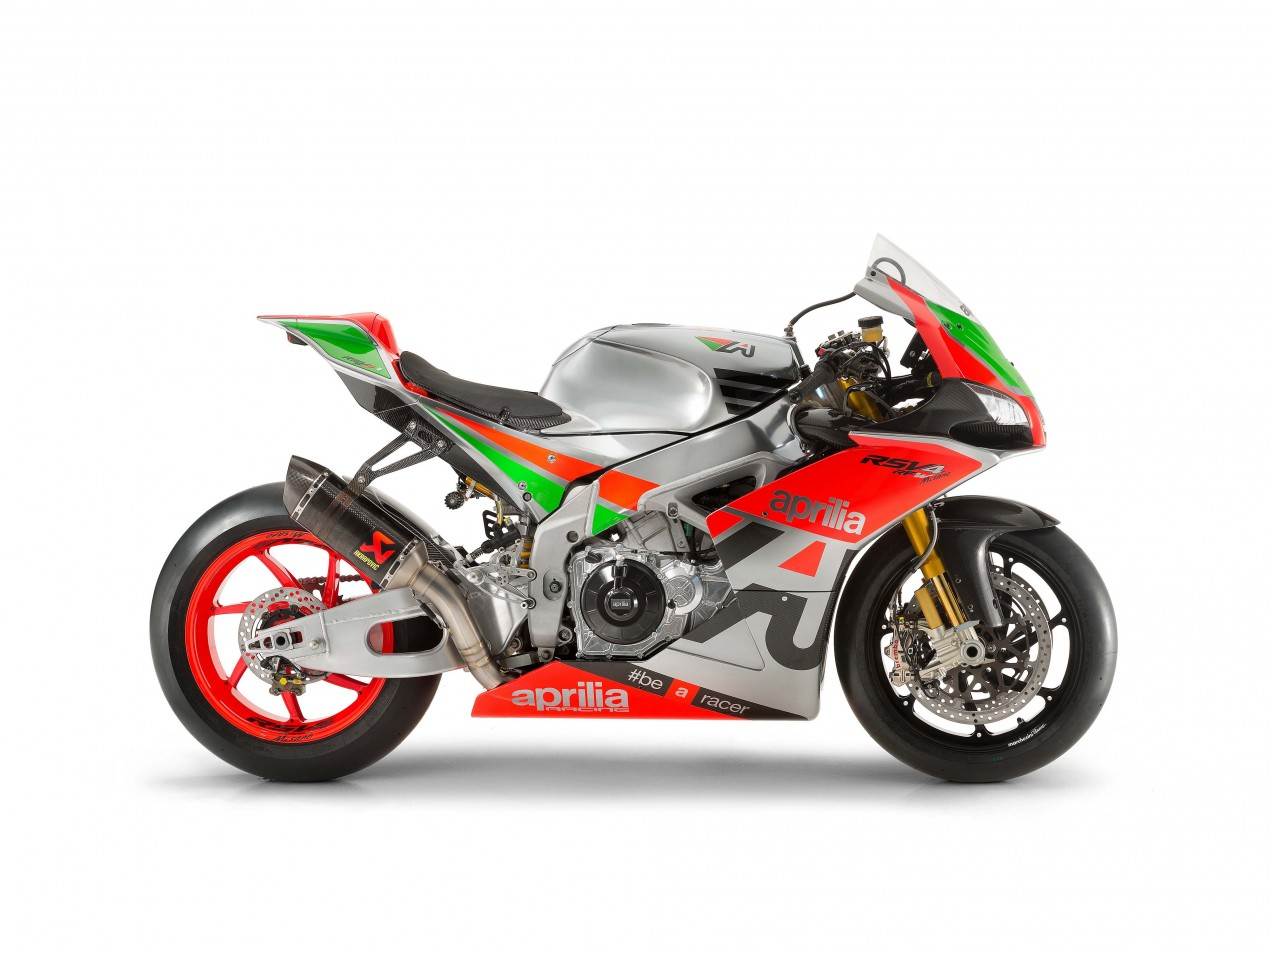 Aprilia RSV4 R-FW Misano - Basically A 230hp MotoGP Bike